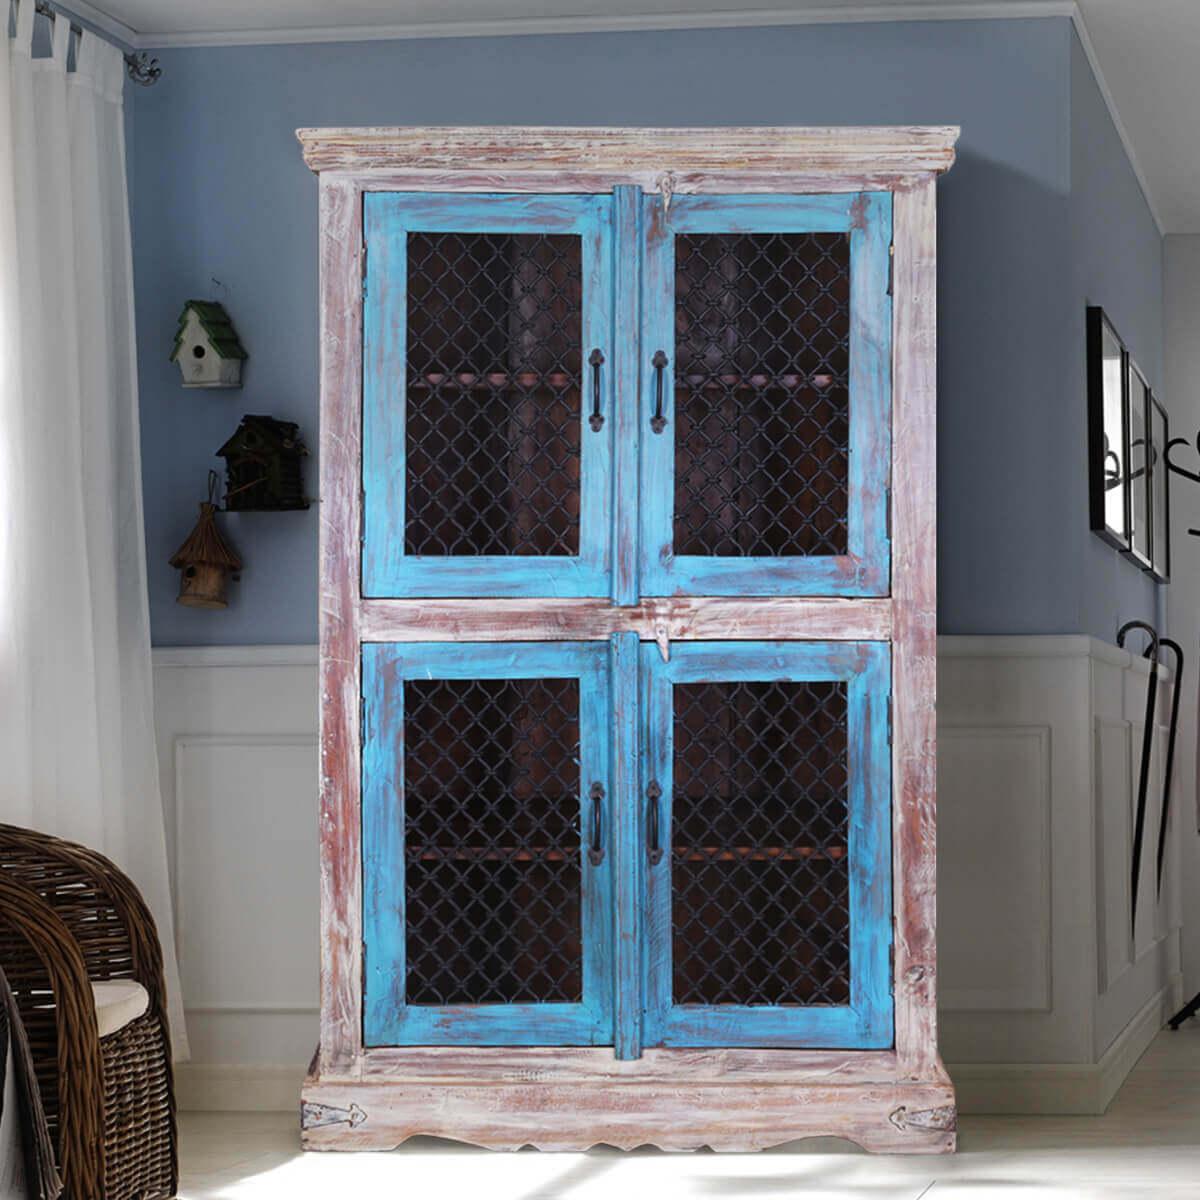 Berwick Rustic Mango Wood Iron Grill Door Large Display Cabinet